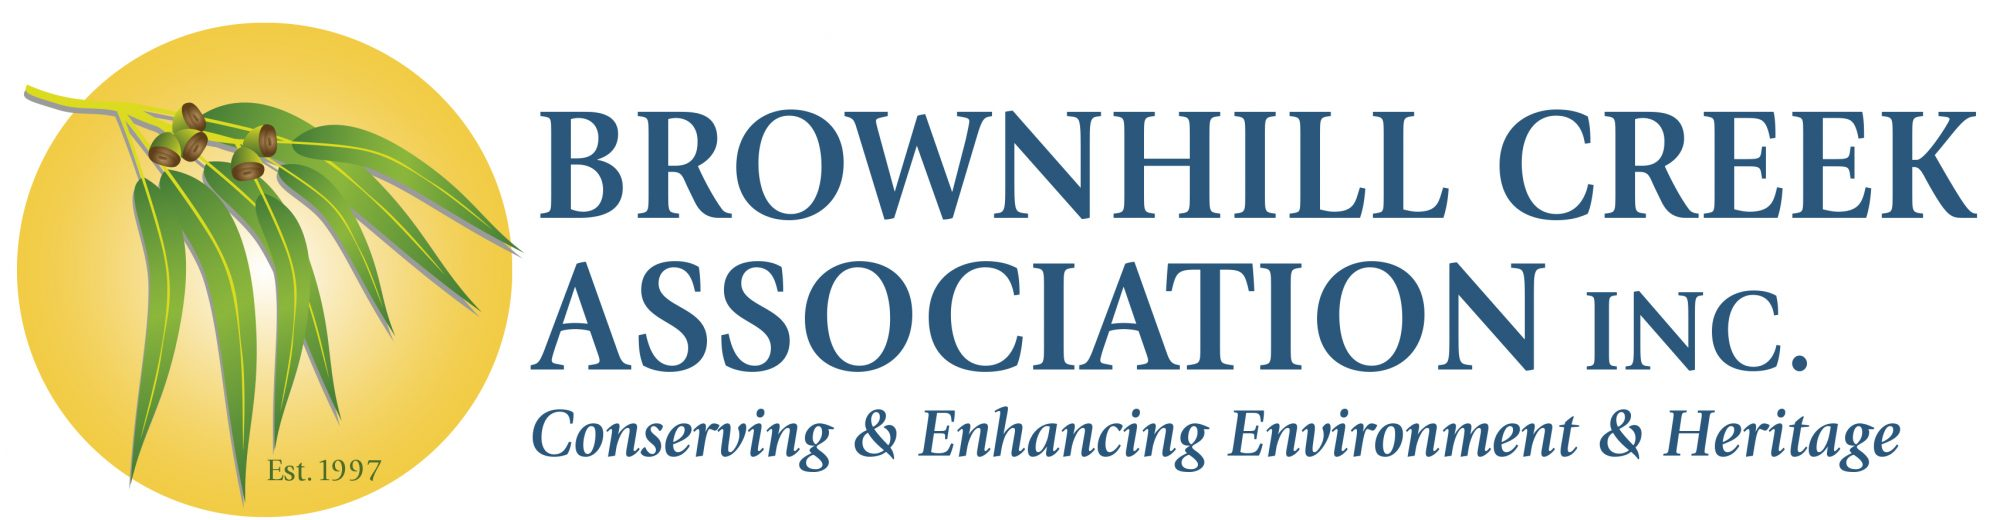 Brownhill Creek Association Incorporated (BCA)